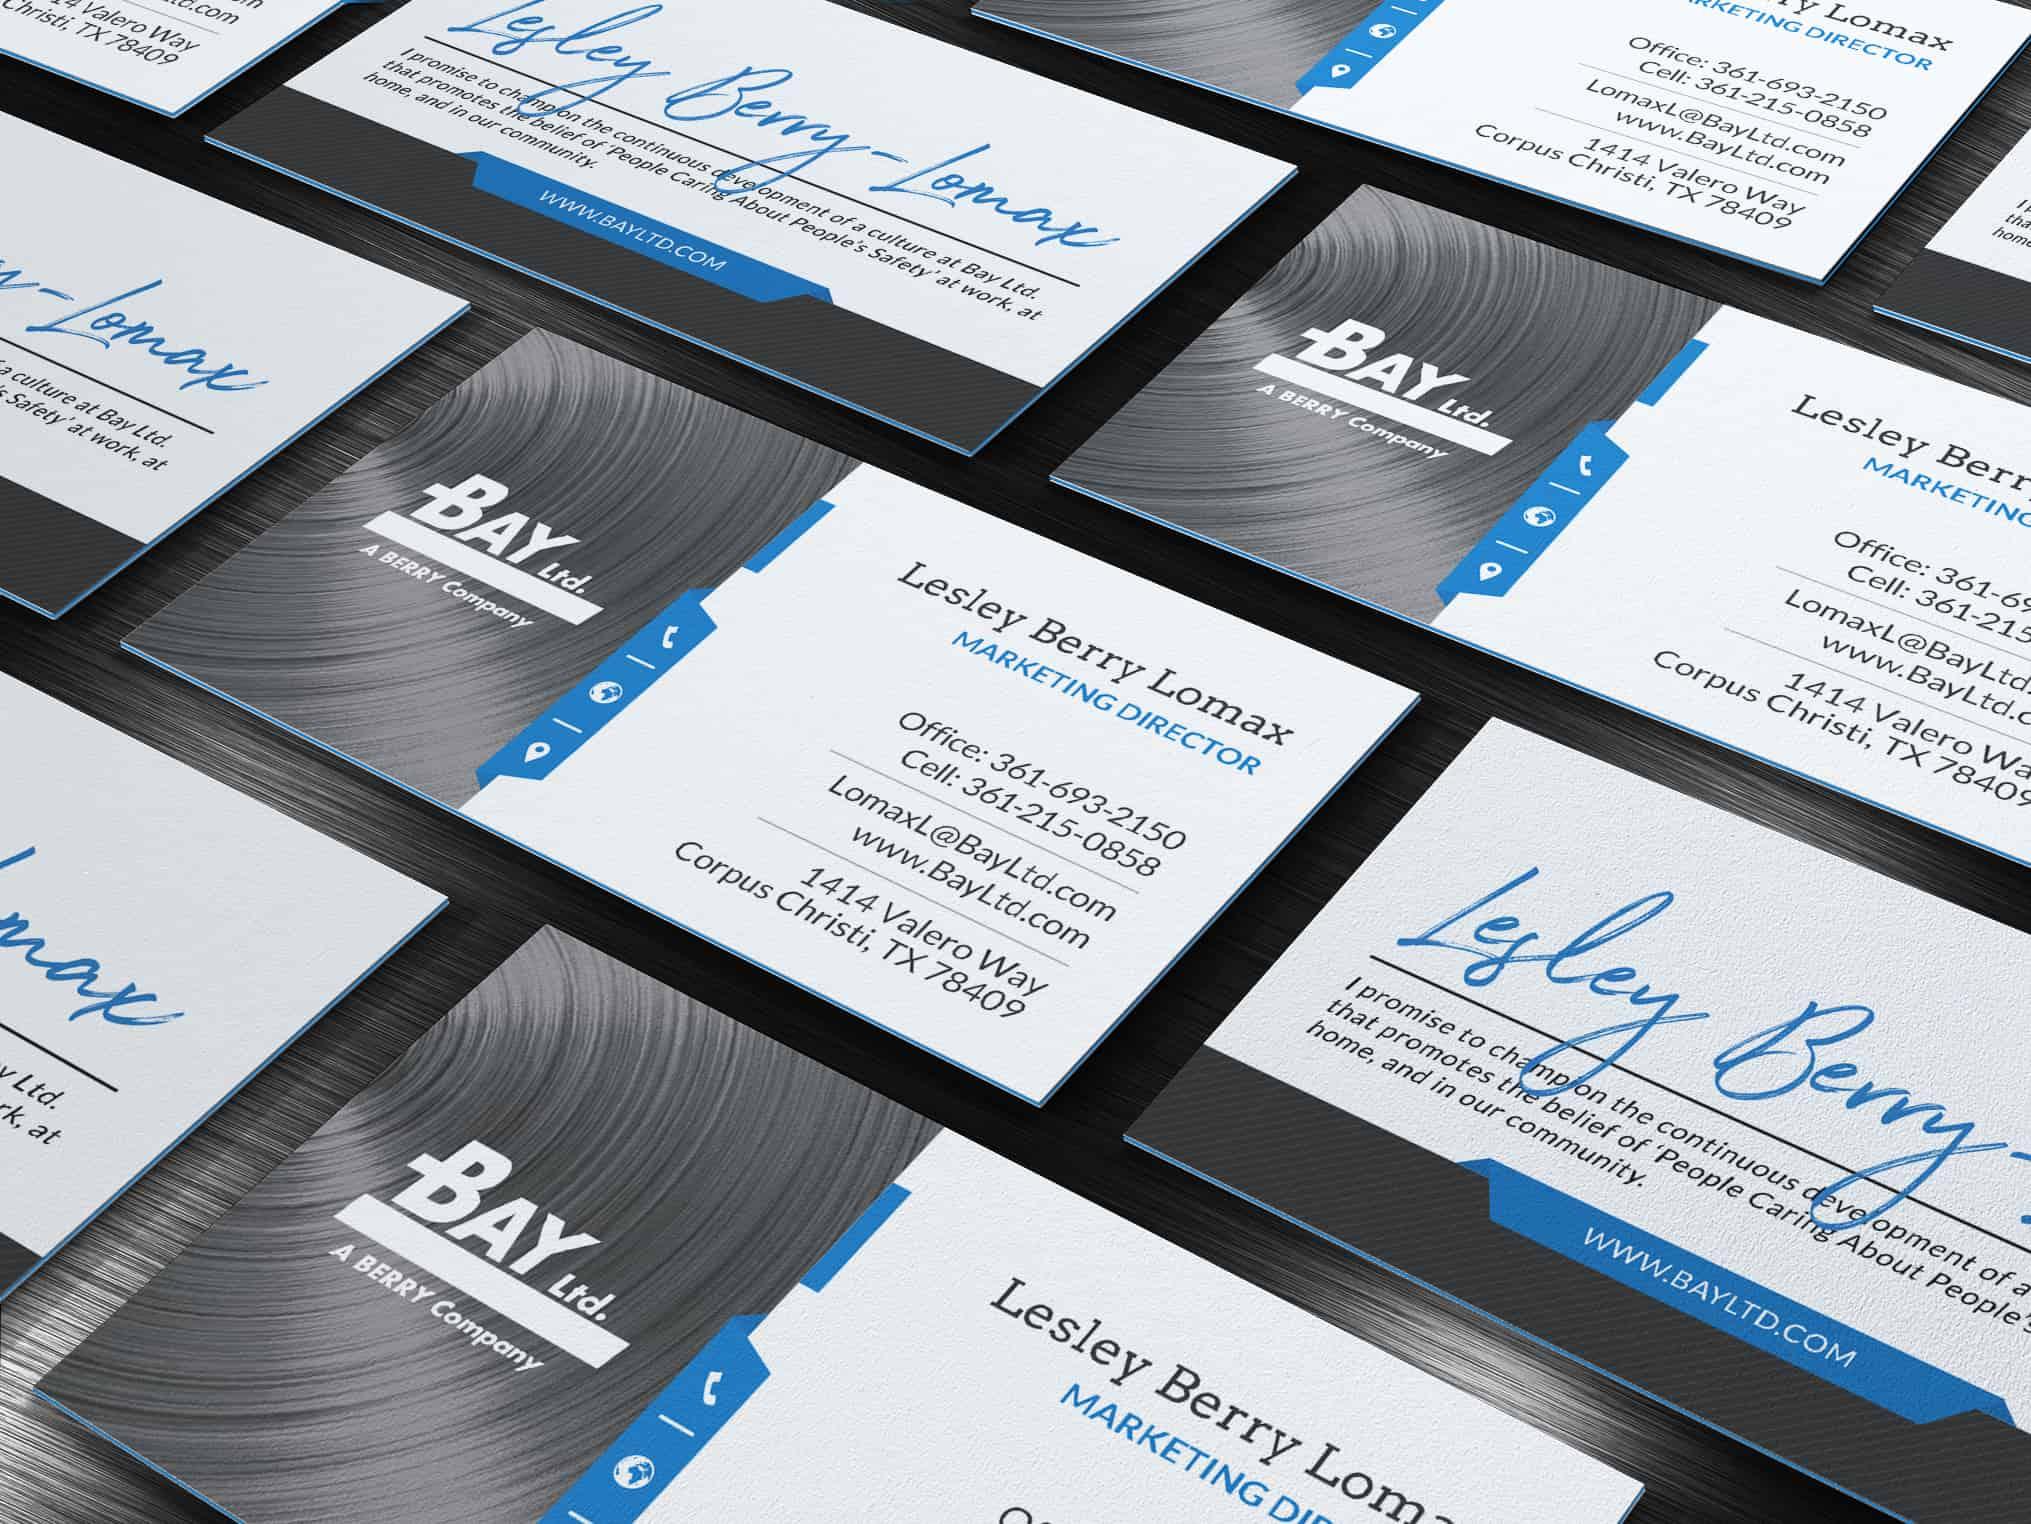 Business cards corpus christi arts arts business card design creative graphic design services colourmoves